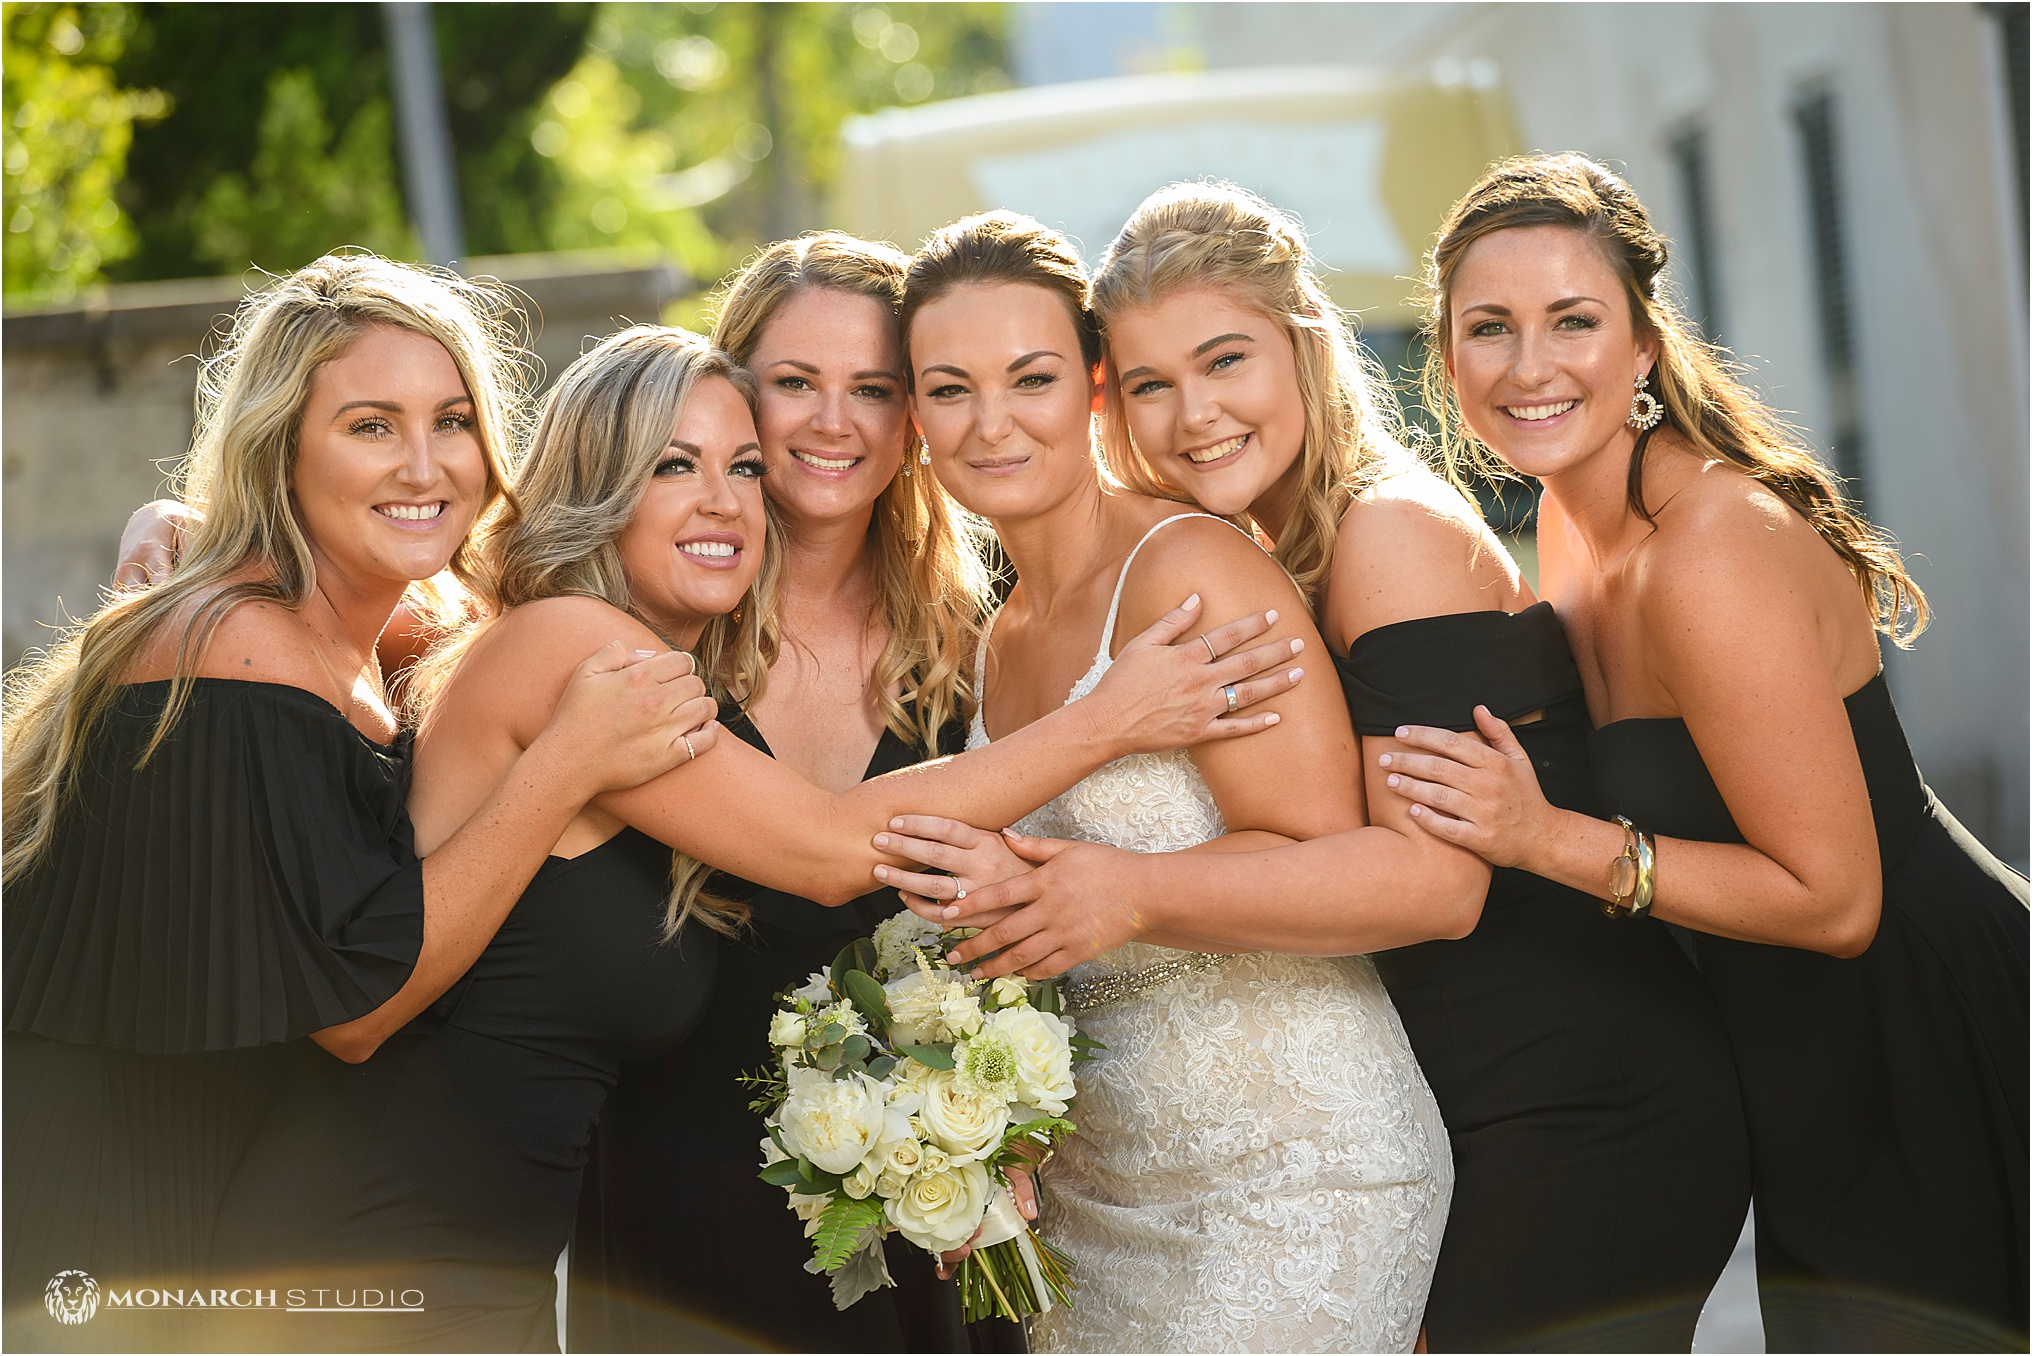 055-whiteroom-wedding-photographer-2019-05-22_0037.jpg